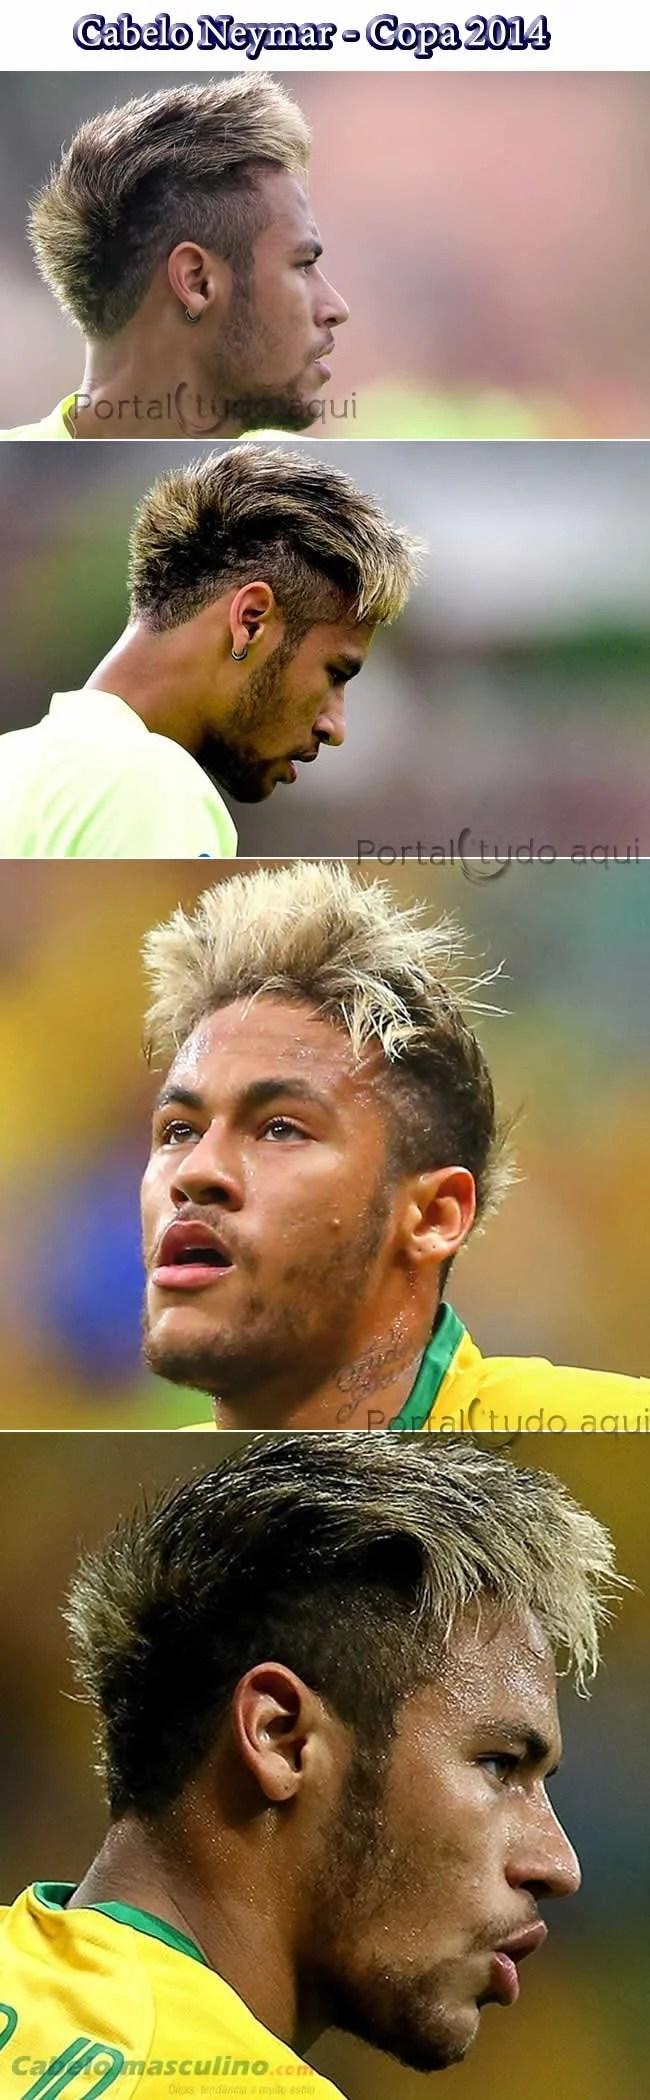 neymar-corte-cabelo-copa-2014-pta